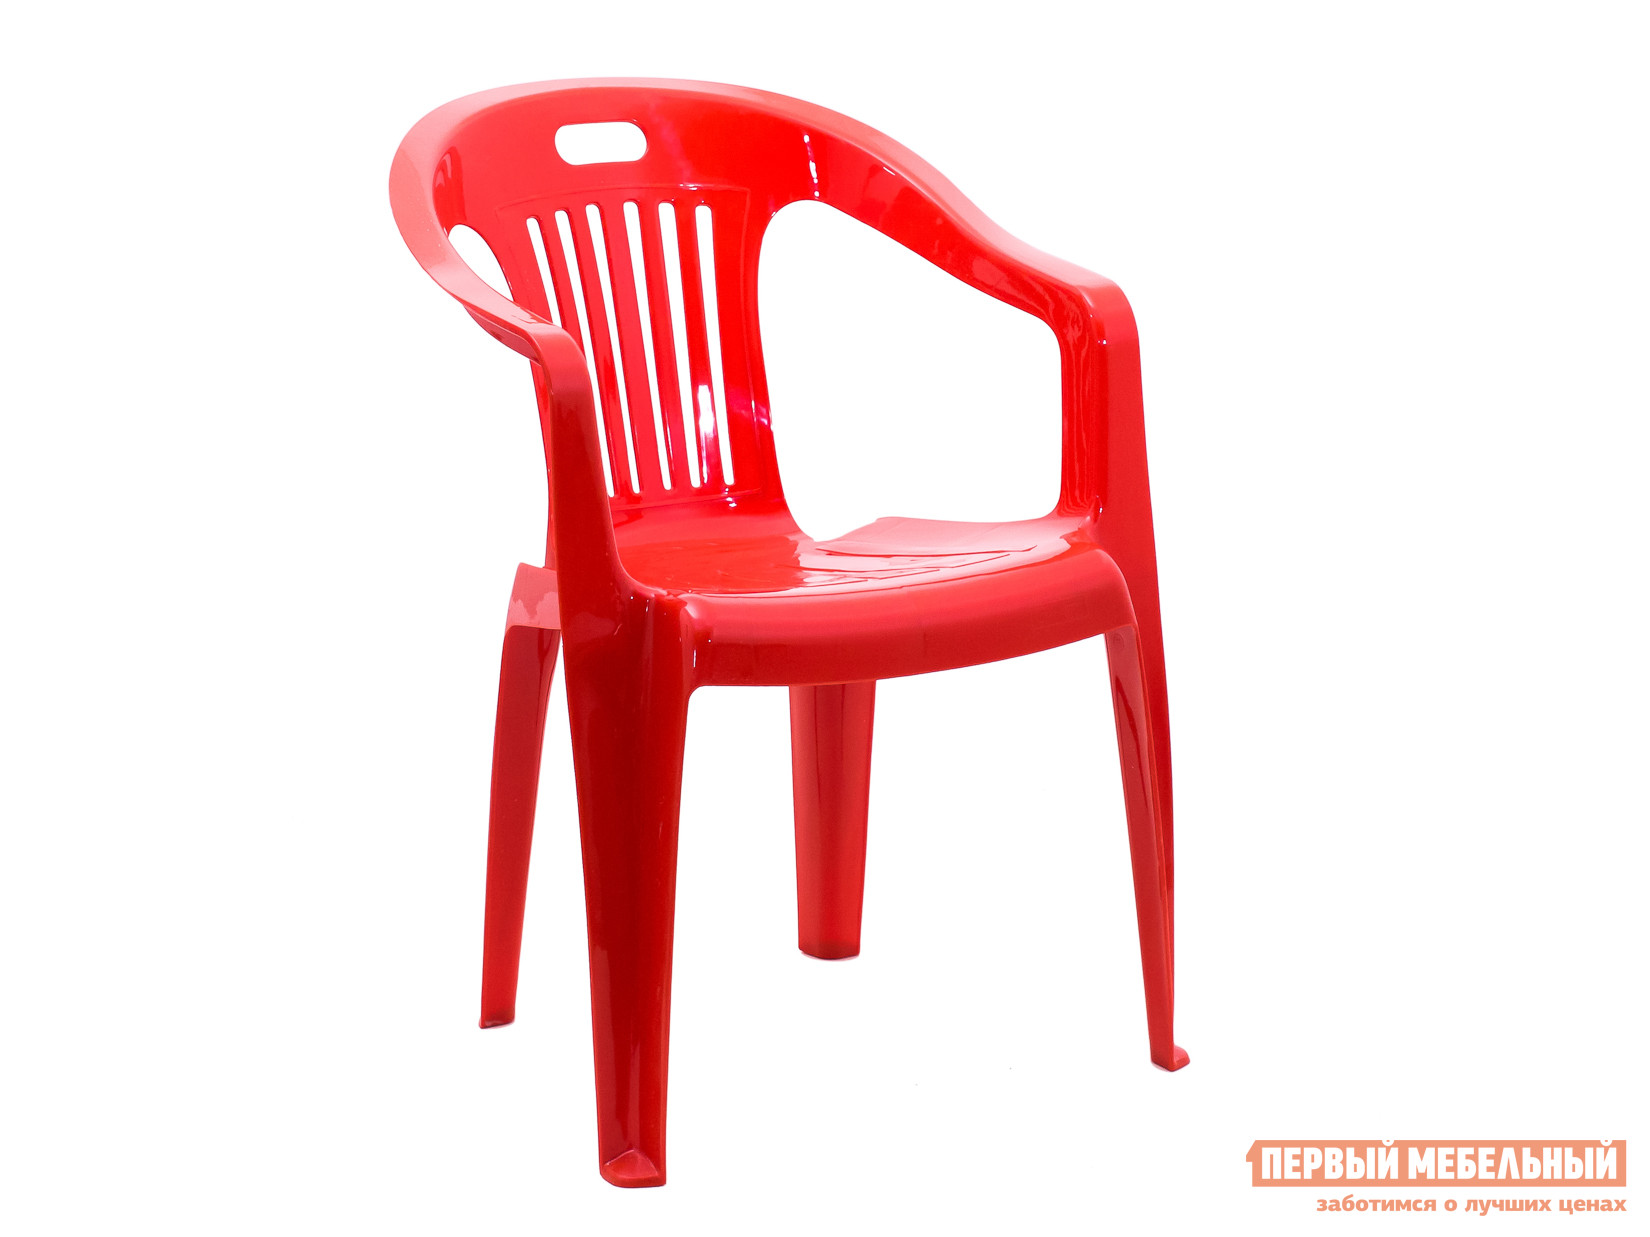 "Пластиковый стул Стандарт Пластик Кресло №5 ""Комфорт-1"" (540x535x780мм) Красный"